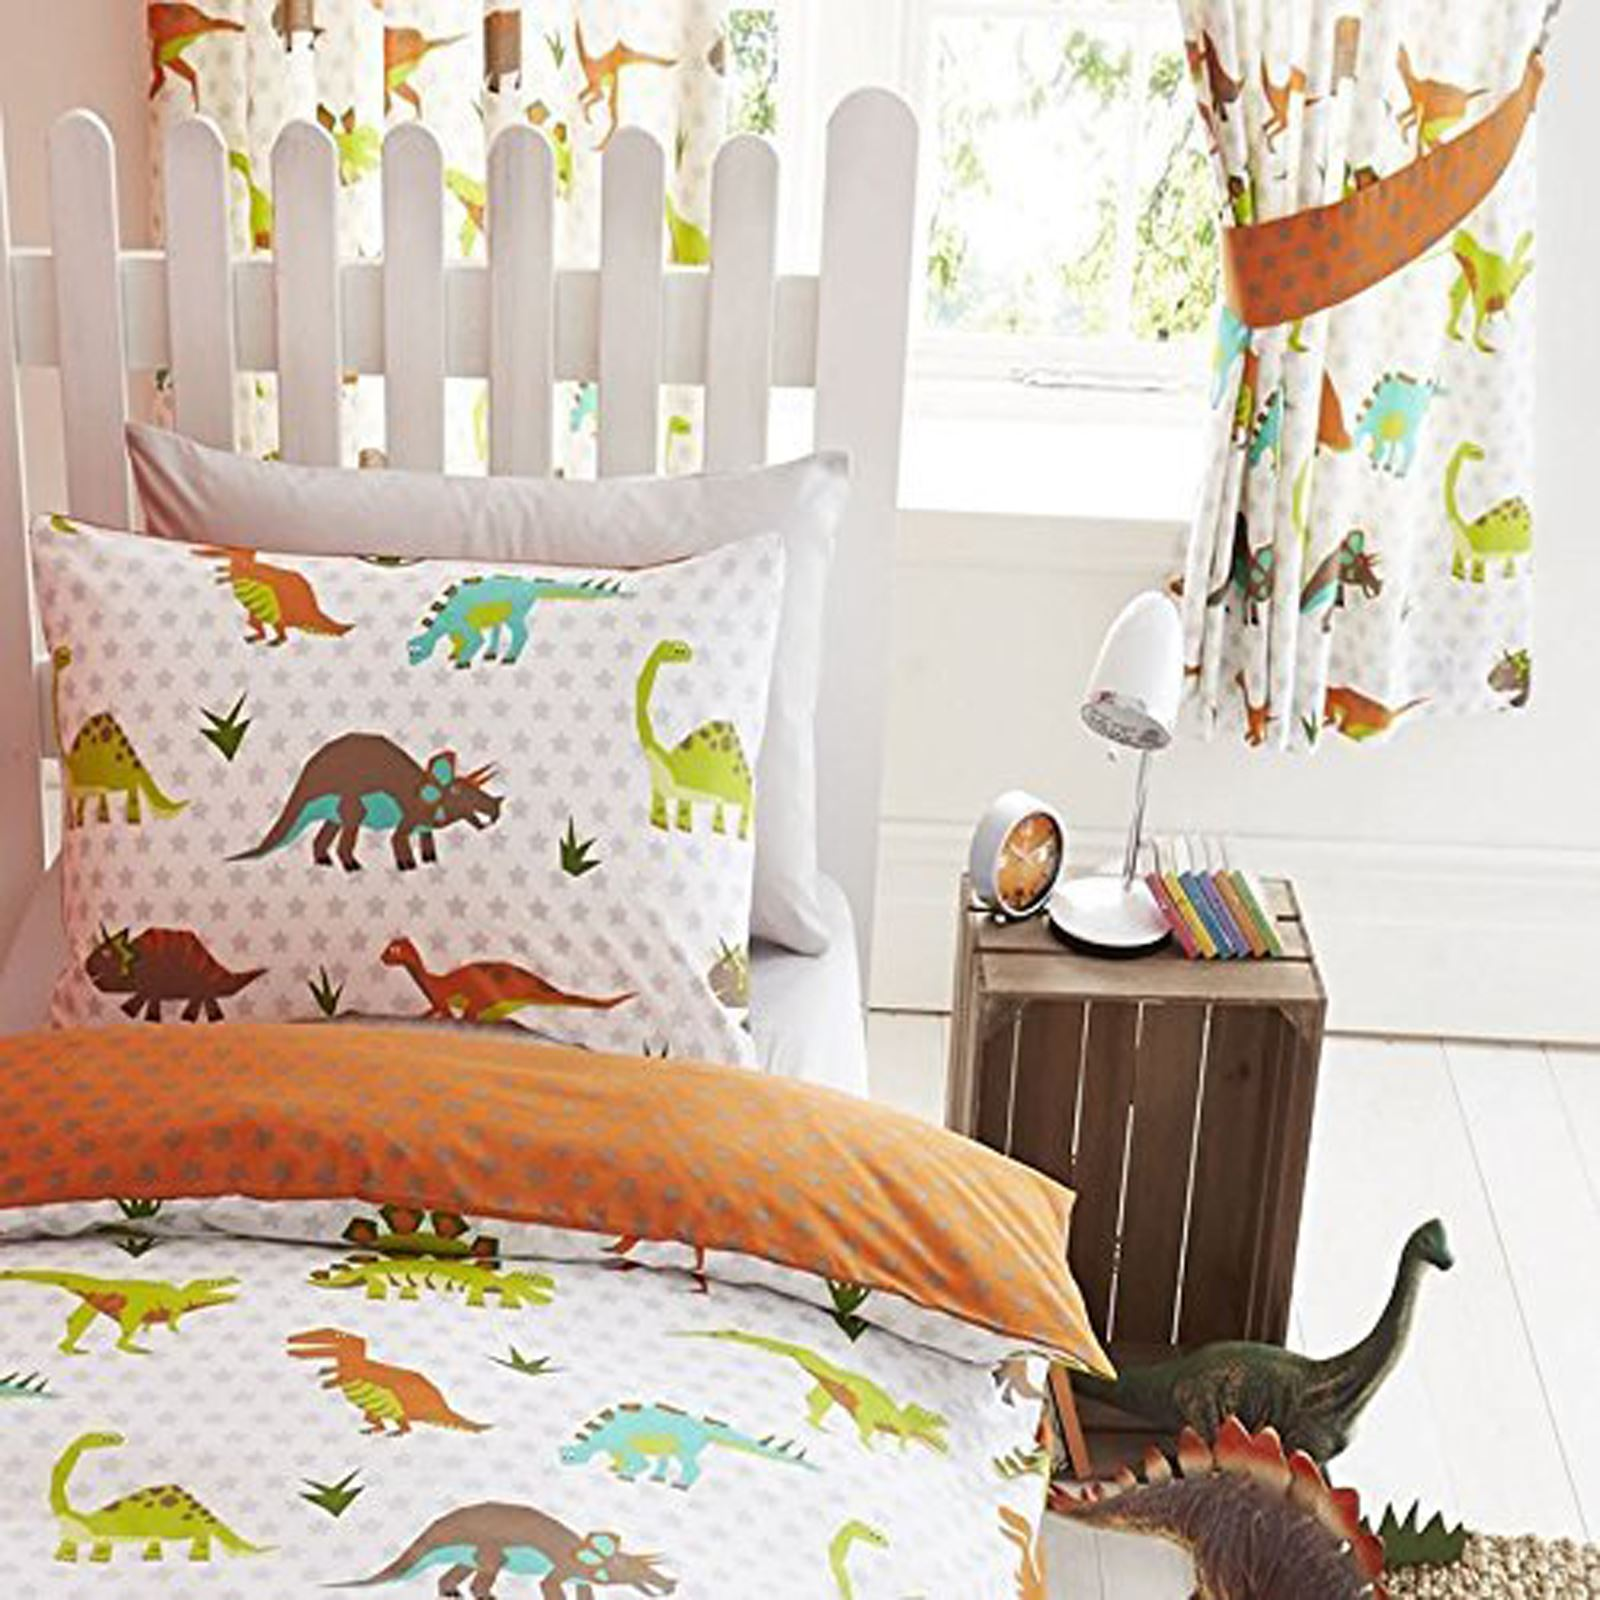 jungen kinder schlafzimmer gardinen 137cm 183cm armee football tarnfarbe ebay. Black Bedroom Furniture Sets. Home Design Ideas